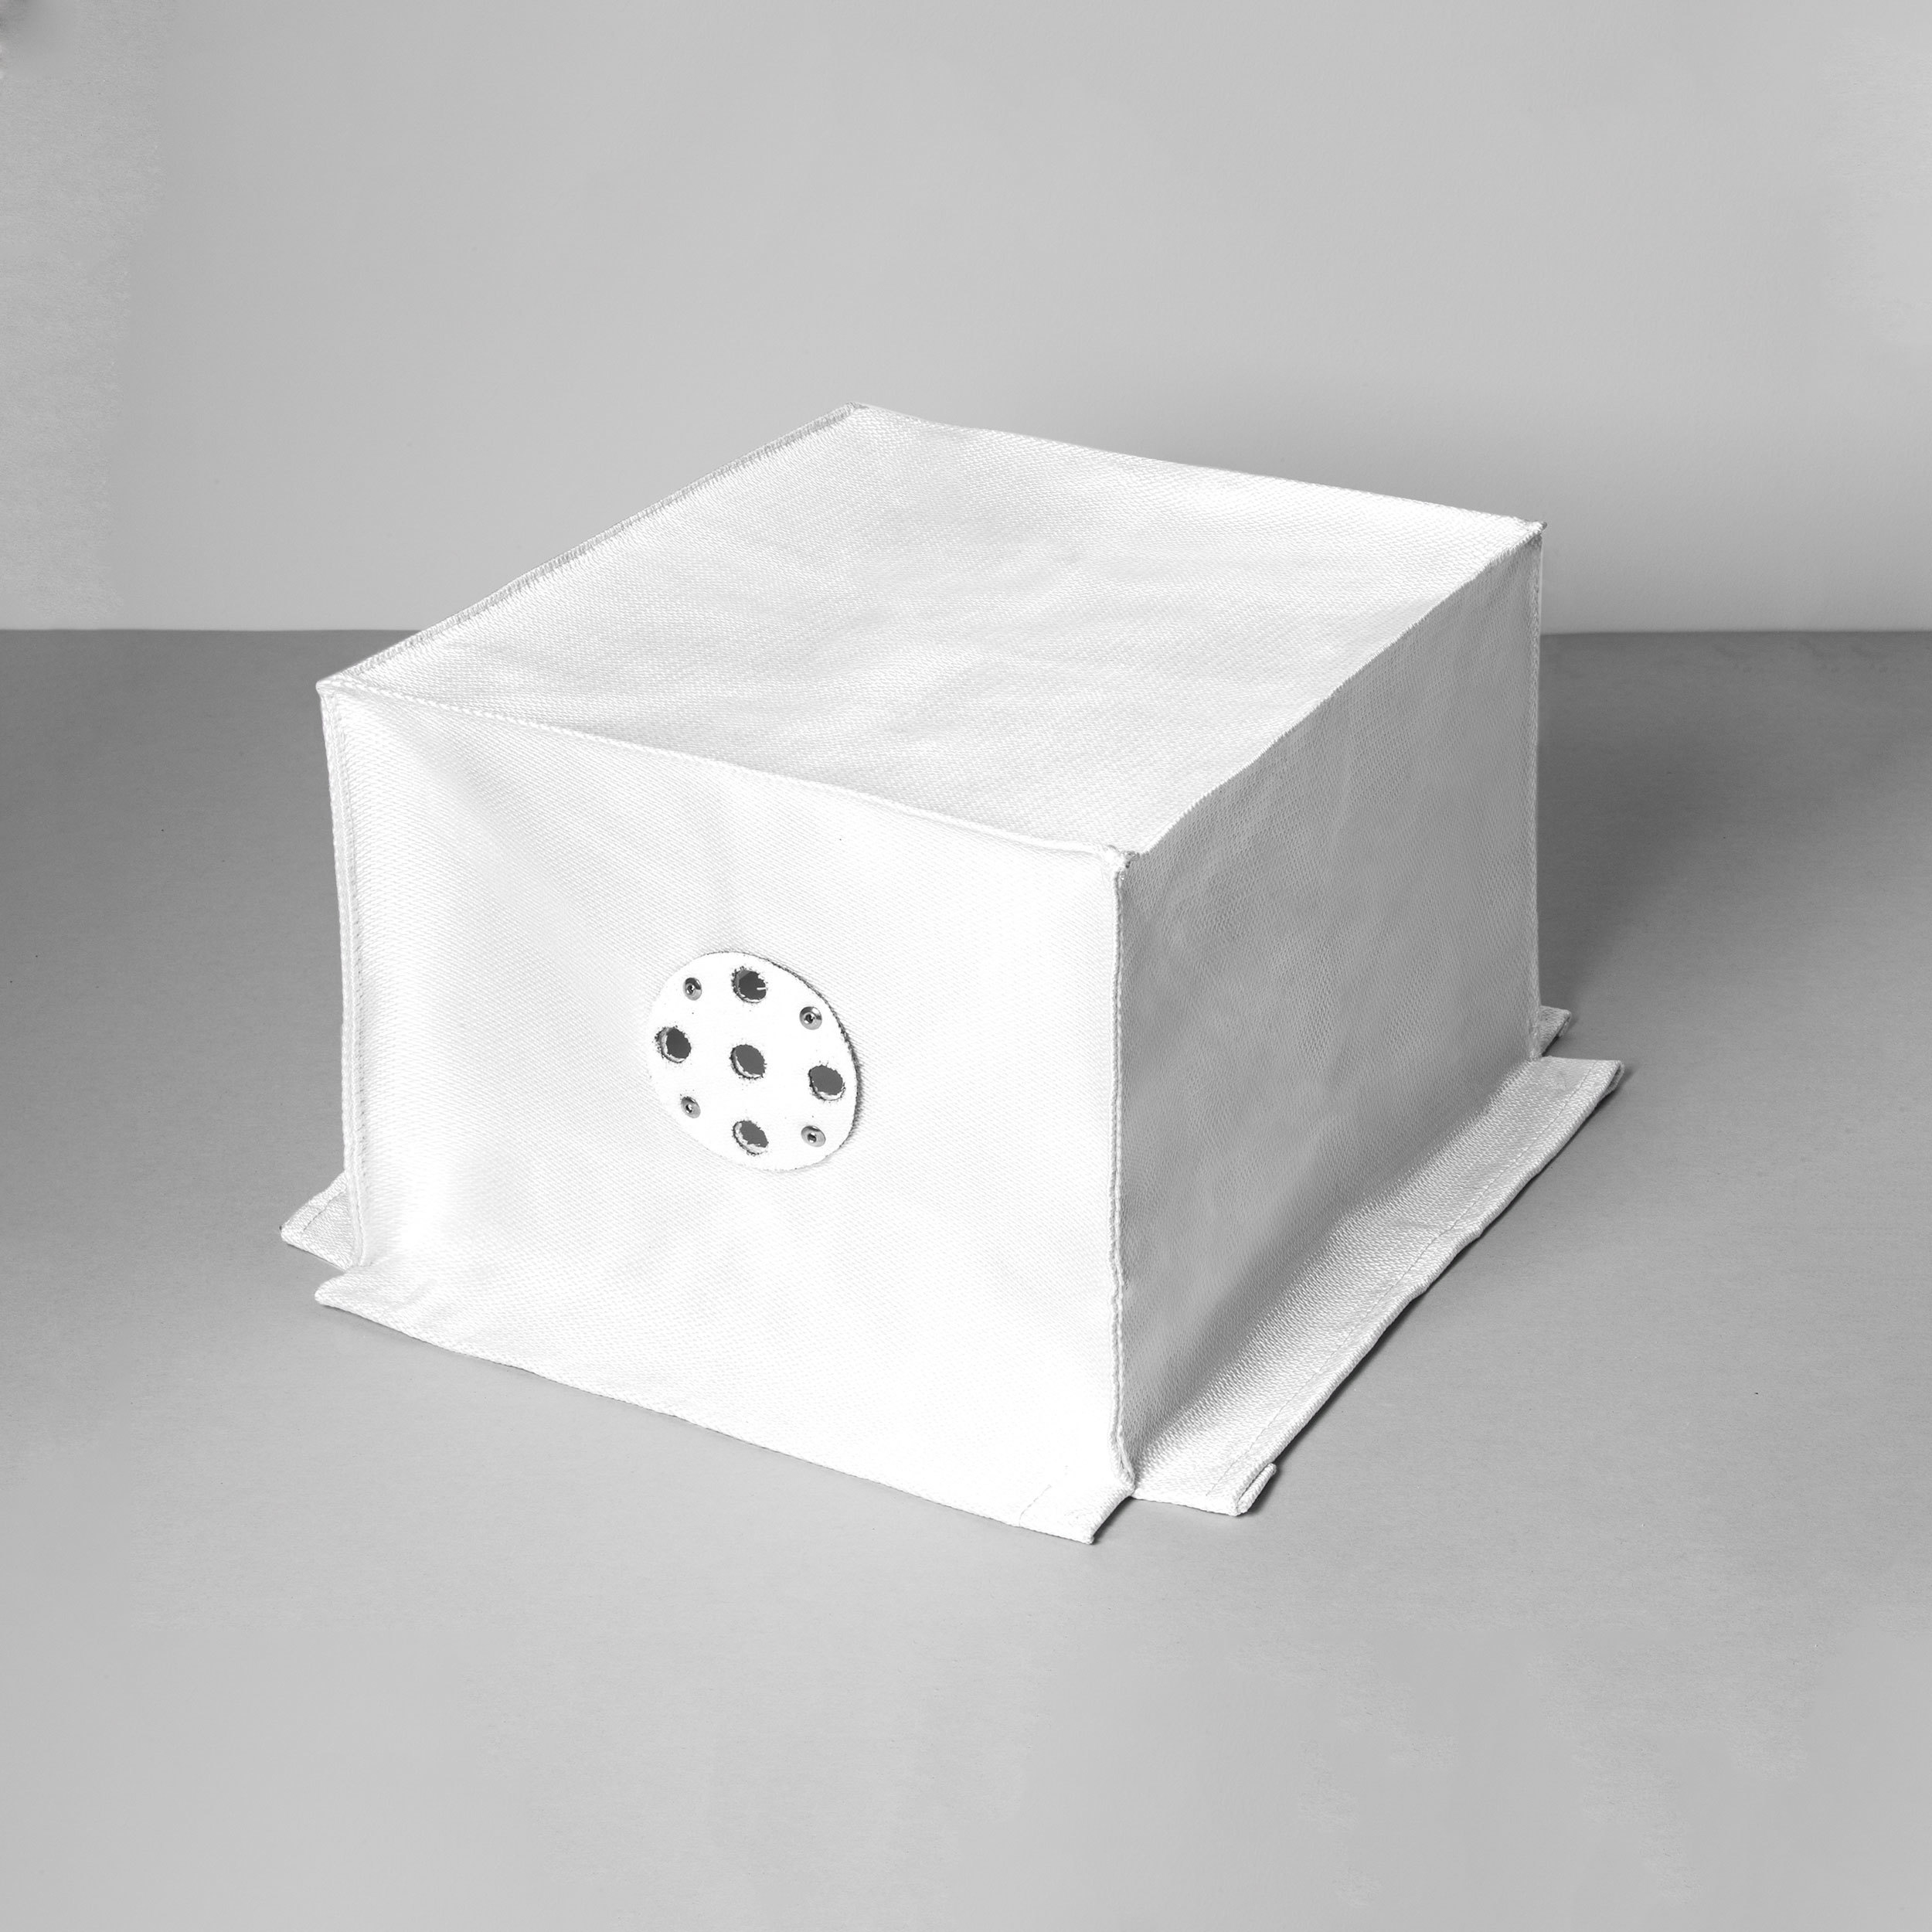 Огнеустойчивый короб Astro Firehood 6010001 (1598), белый - фото 1